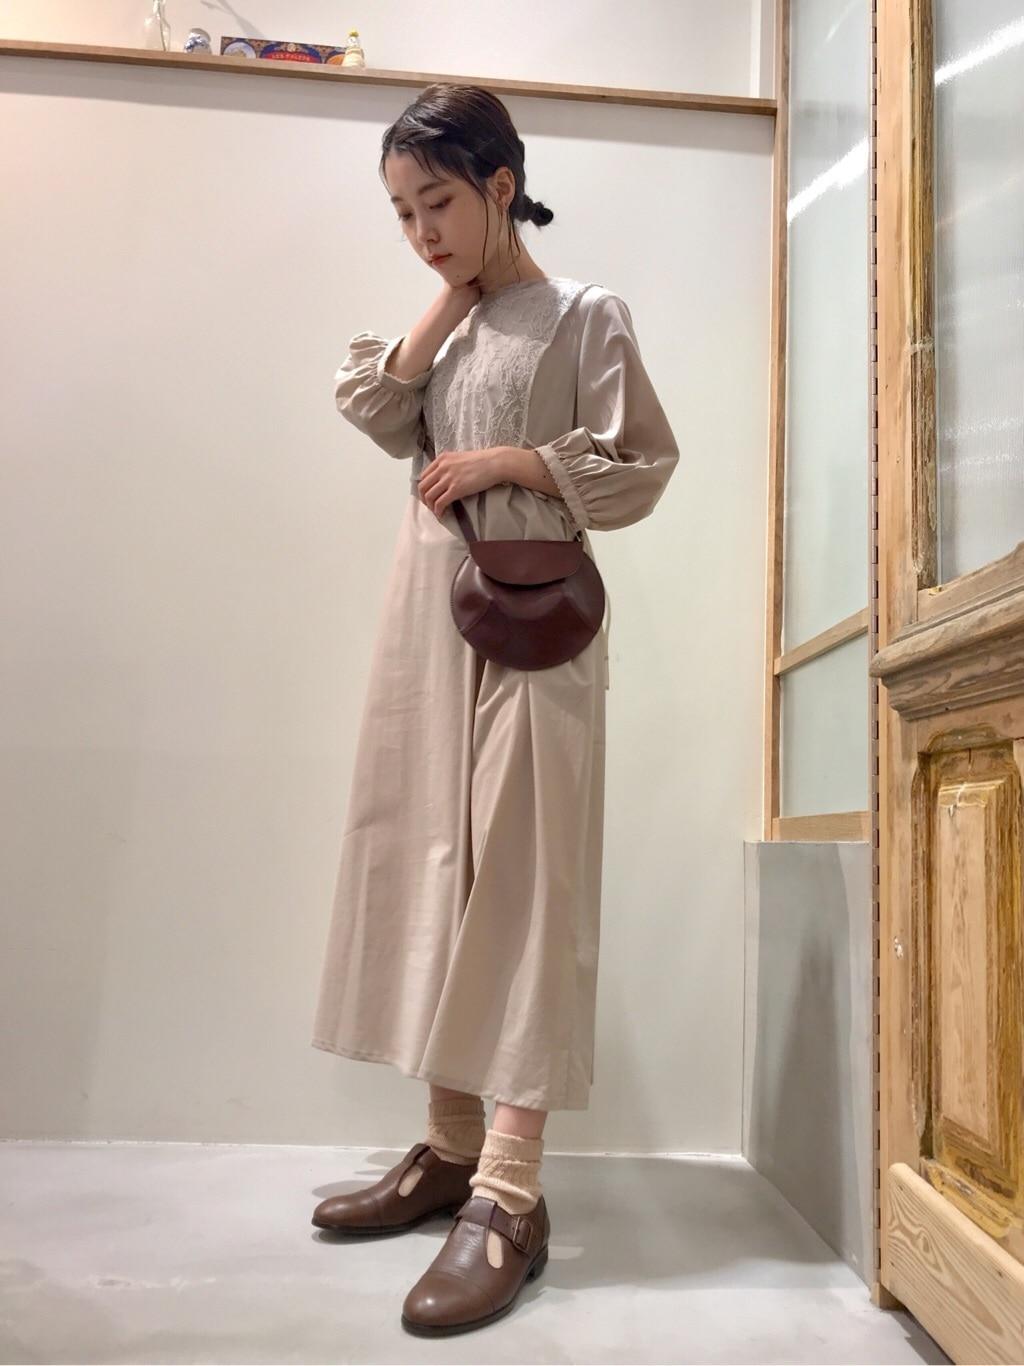 bulle de savon 渋谷スクランブルスクエア 身長:153cm 2020.07.22